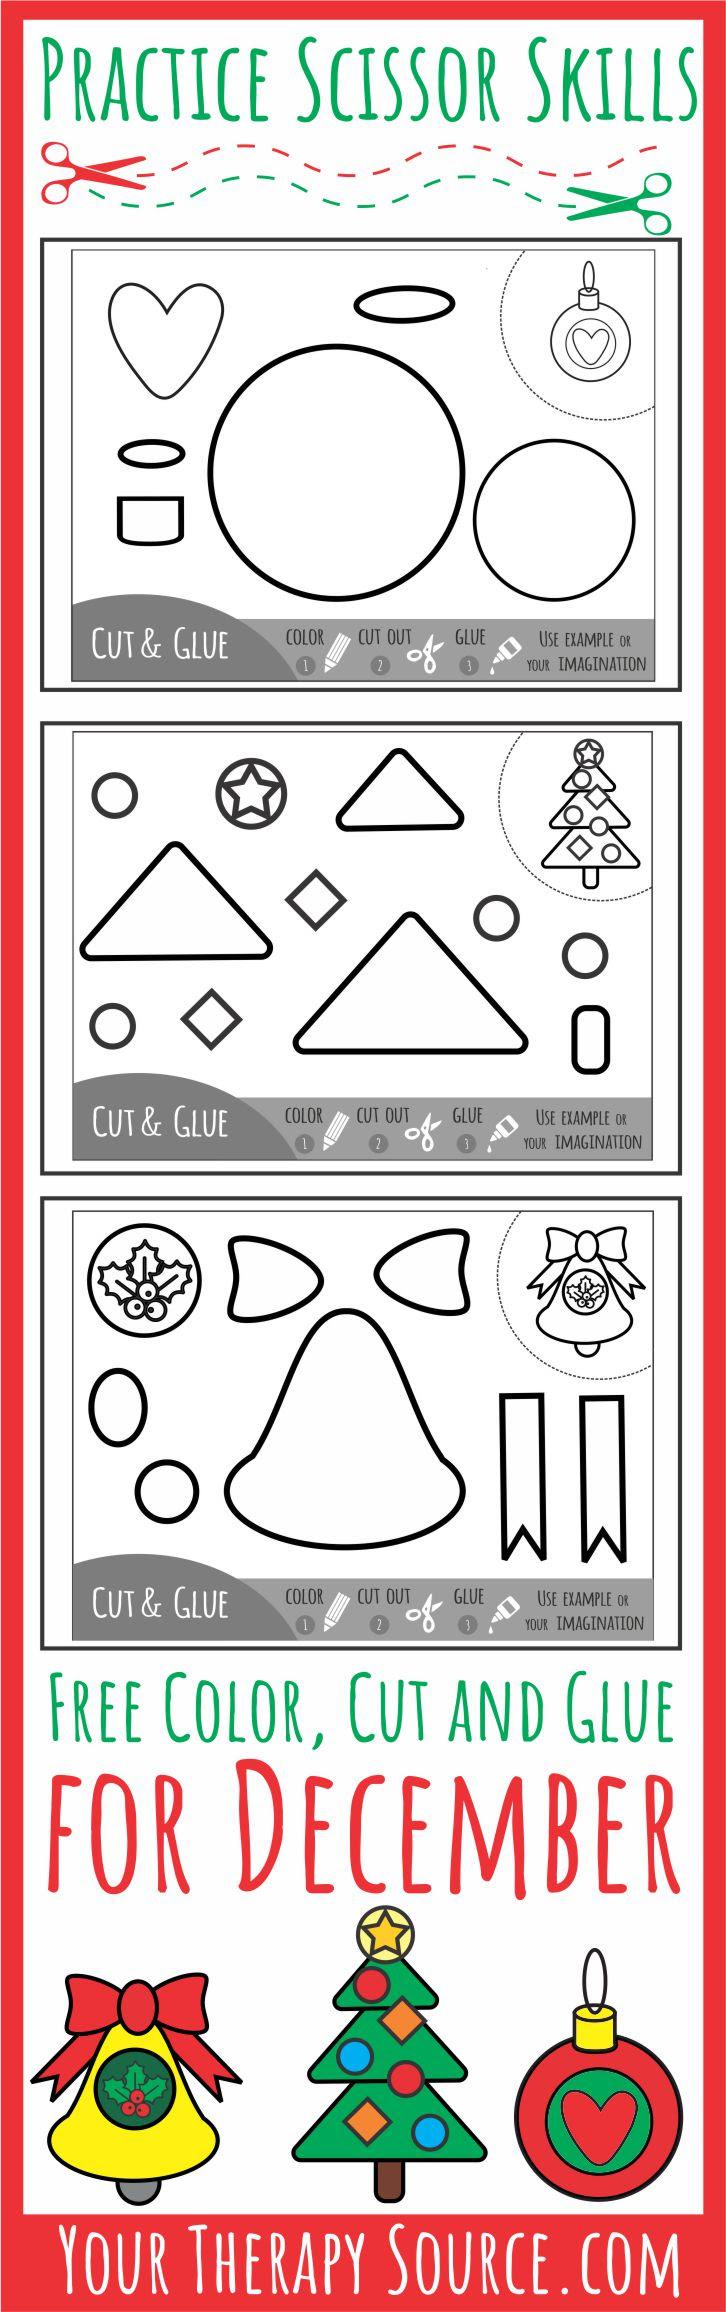 Color Cut Glue December